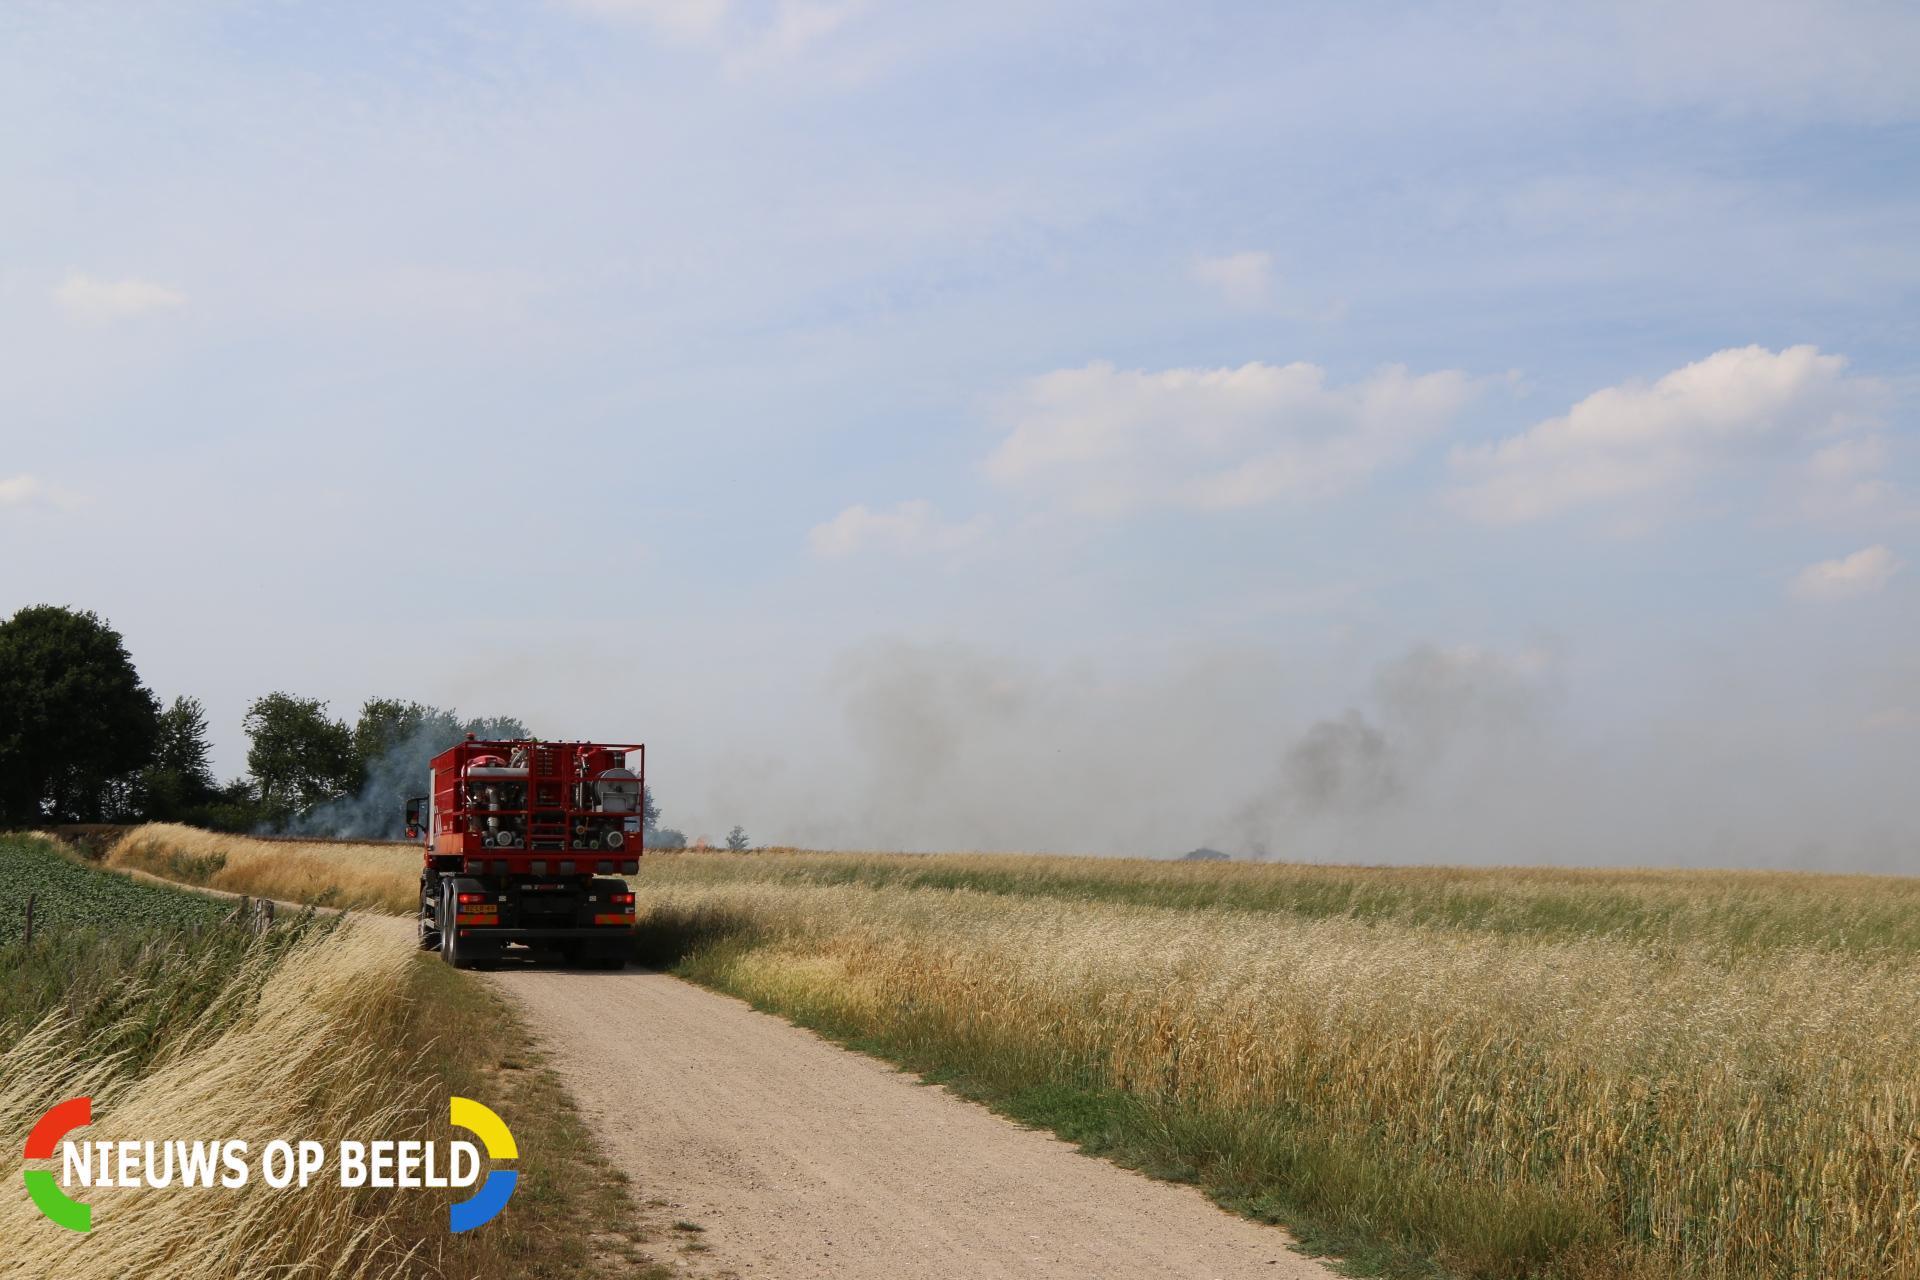 Grote buitenbrand in korenveld Sjteinpaedje Sittard